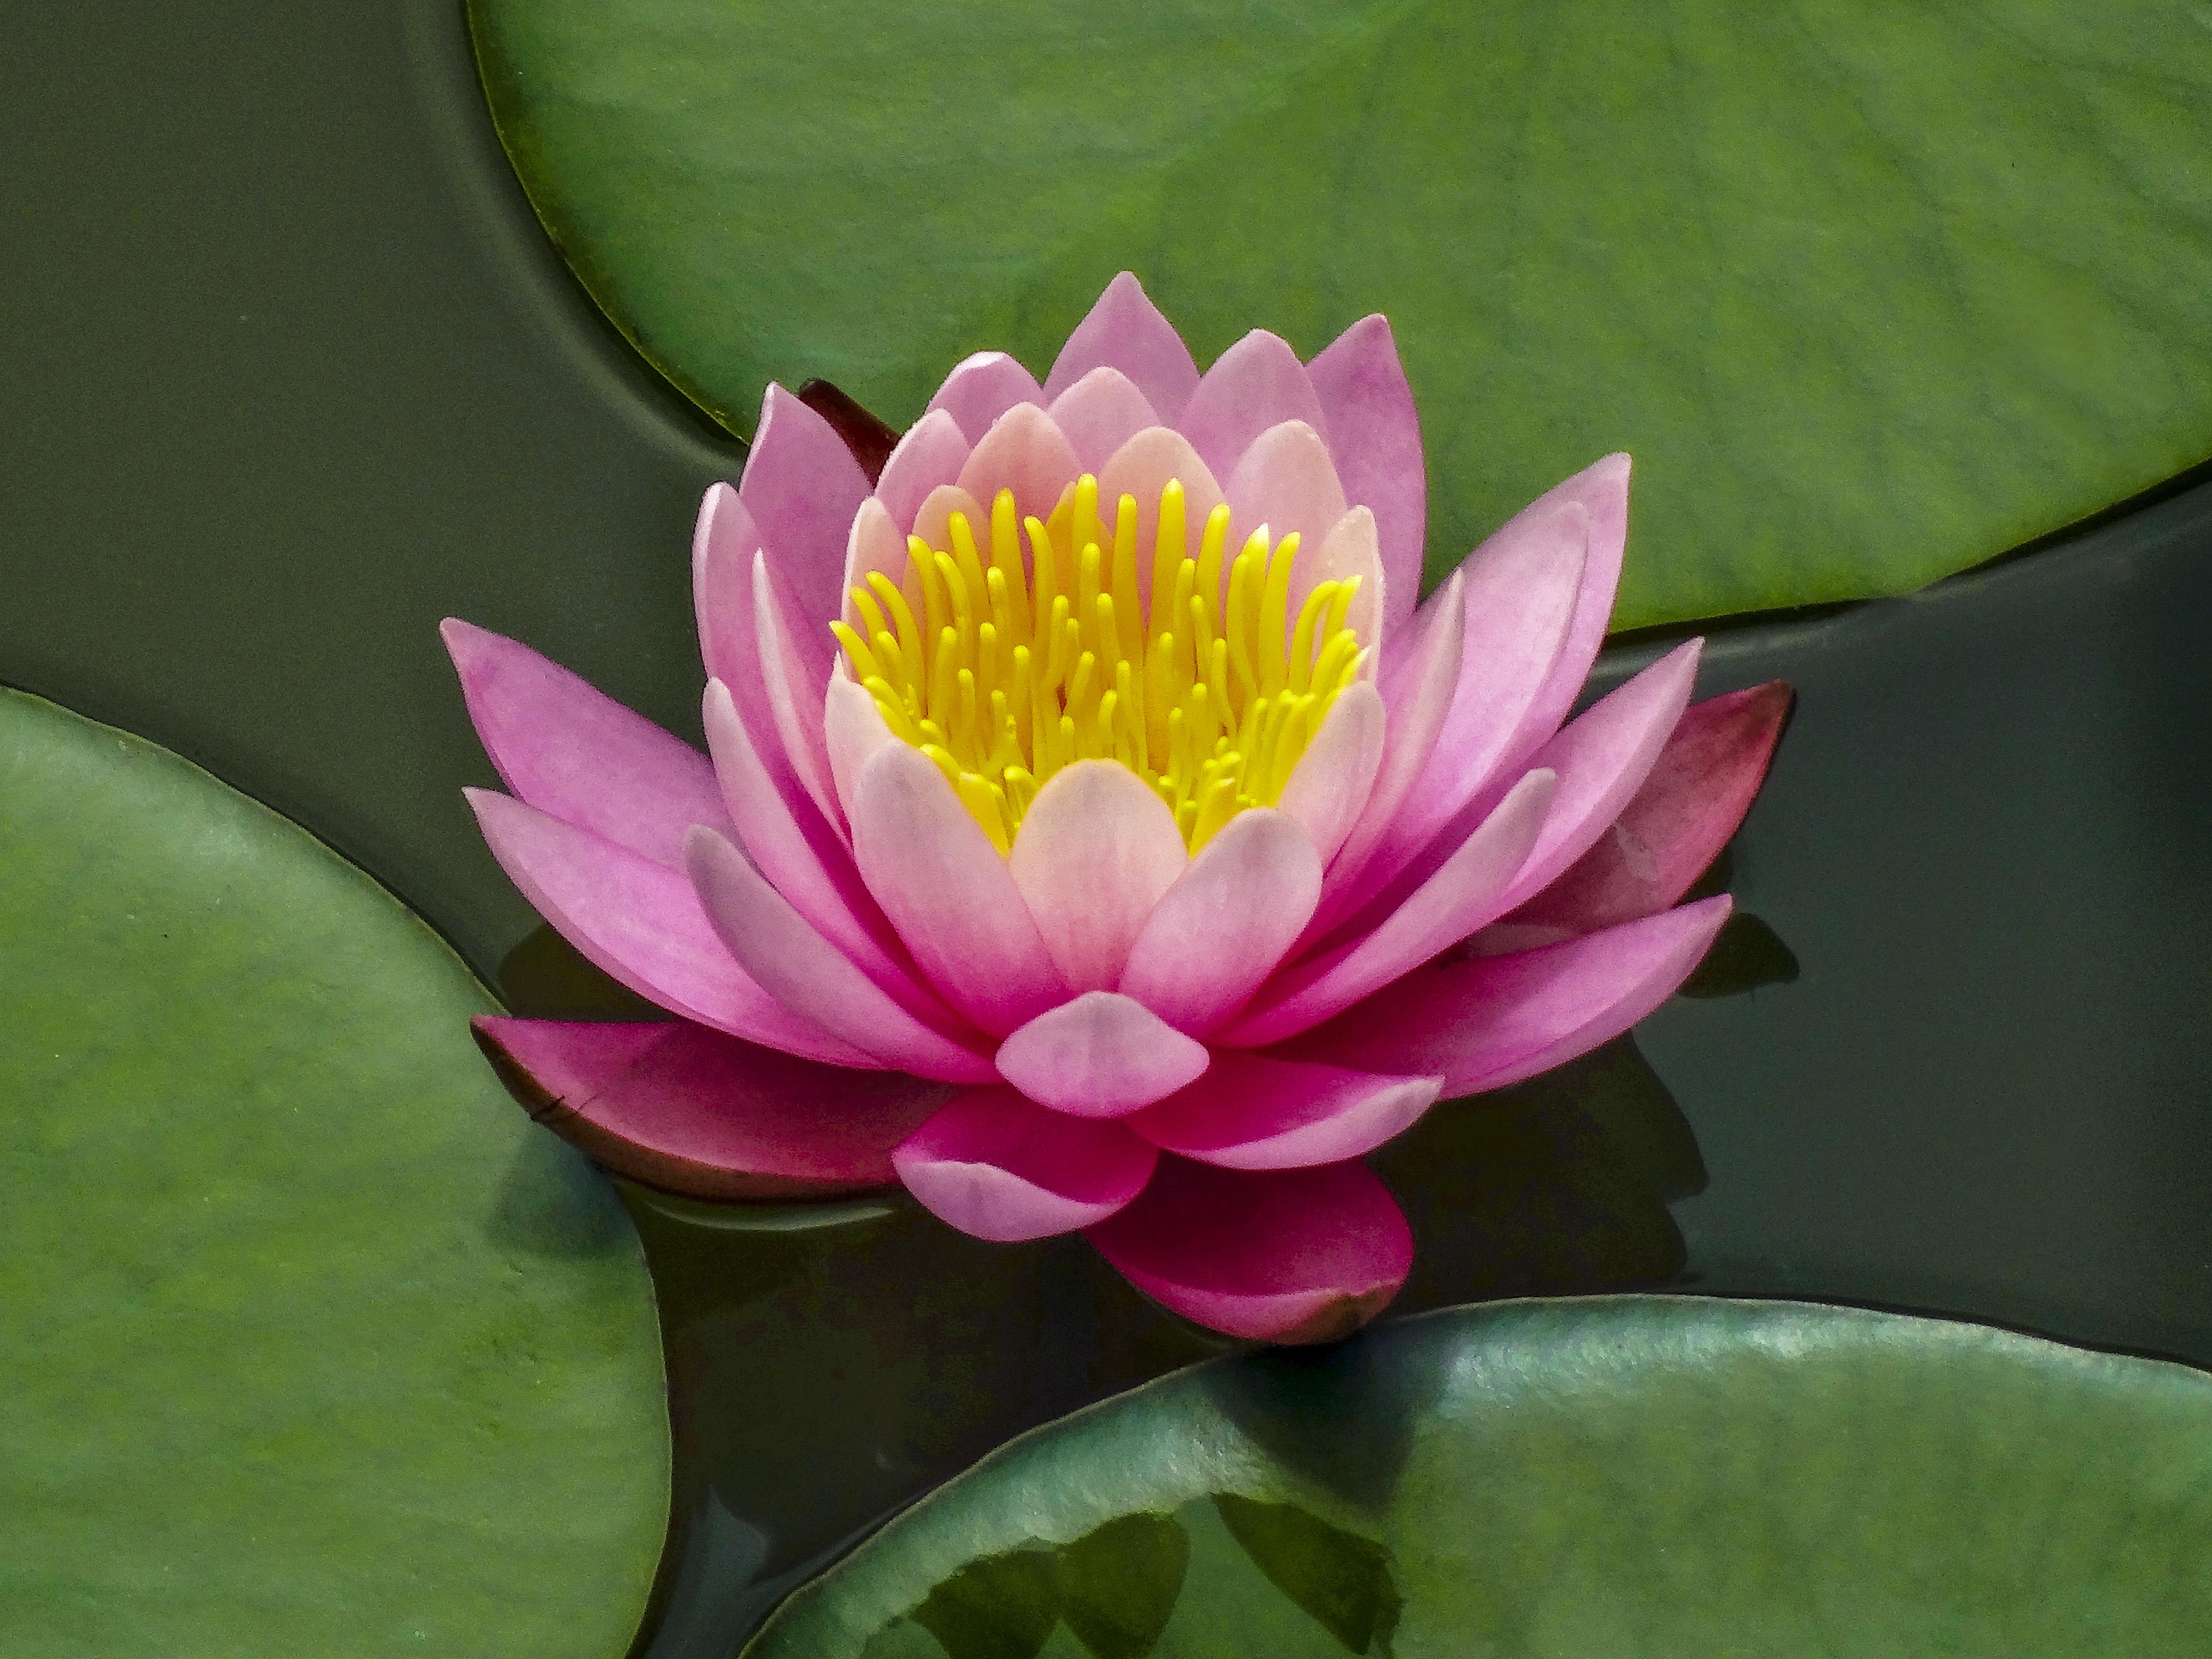 Free Images Blossom Petal Lake Green Botany Pink Sacred